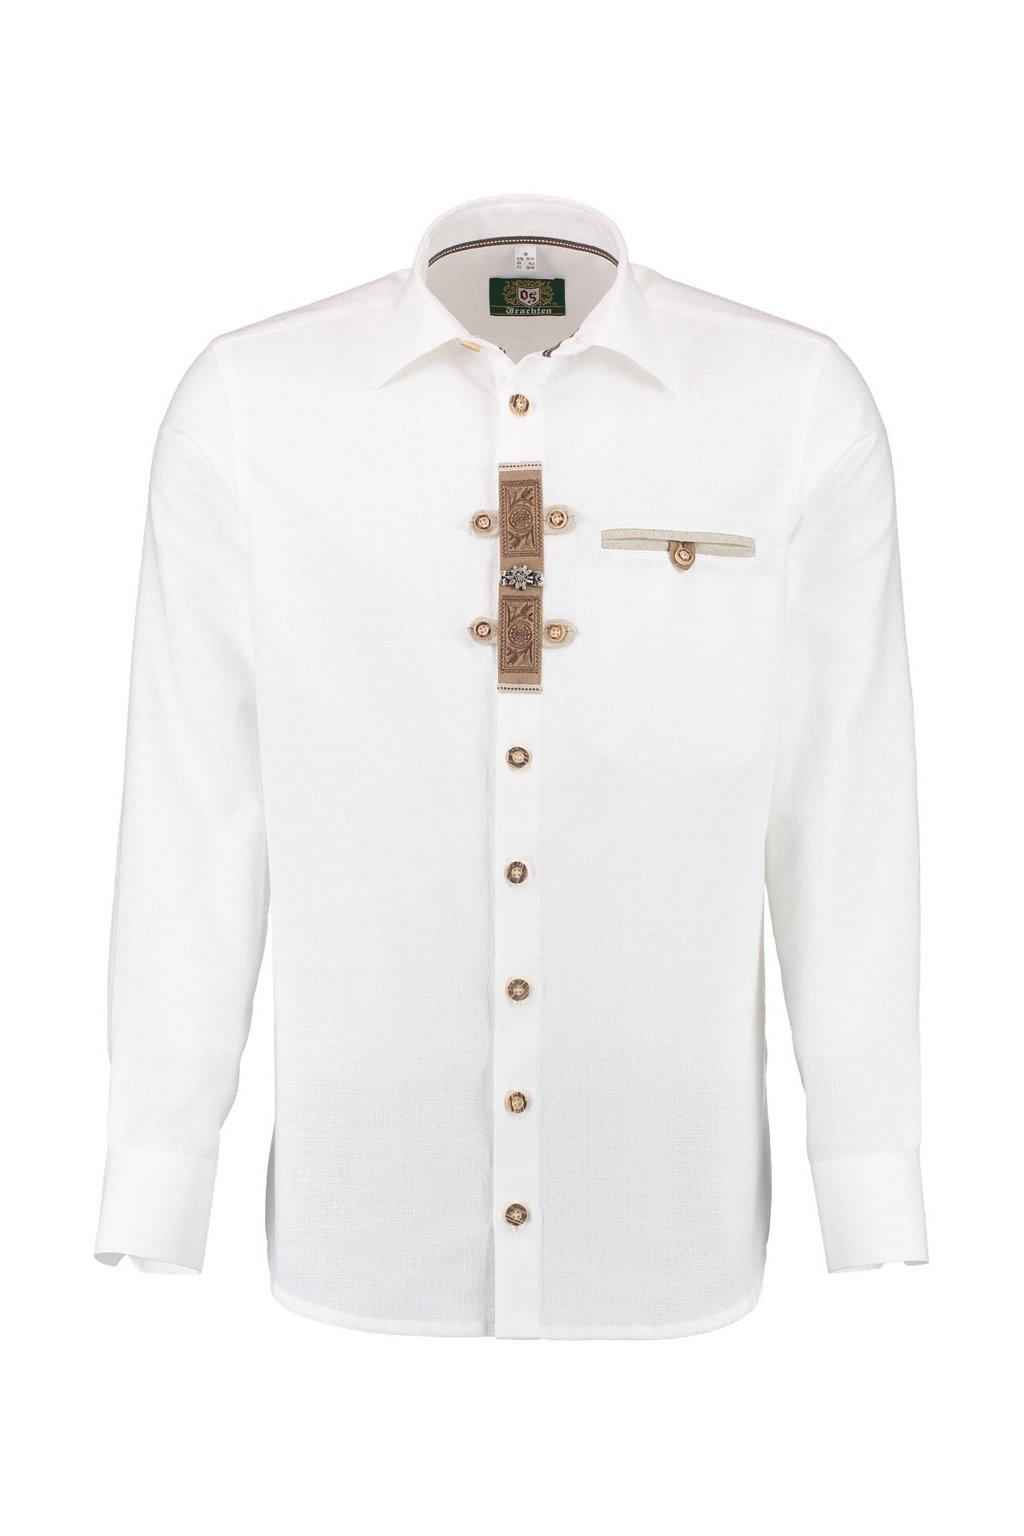 ORBIS - bílá pánská košile Slim Fit, dlouhý rukáv (1011)